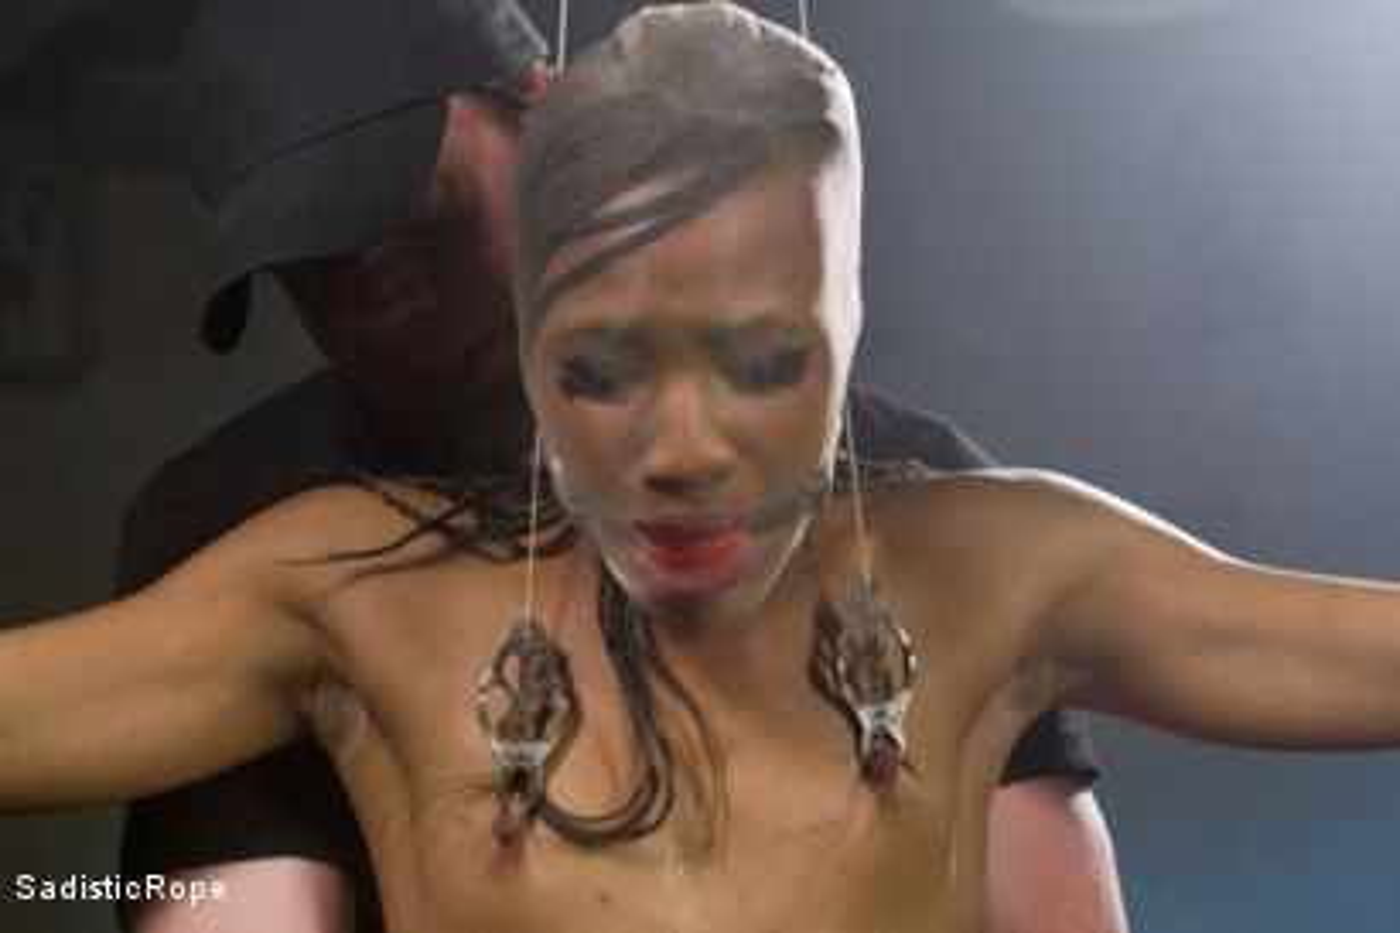 Photo number 3 from Wreaking Havoc on Nikki Darling shot for Sadistic Rope on Kink.com. Featuring Nikki Darling in hardcore BDSM & Fetish porn.